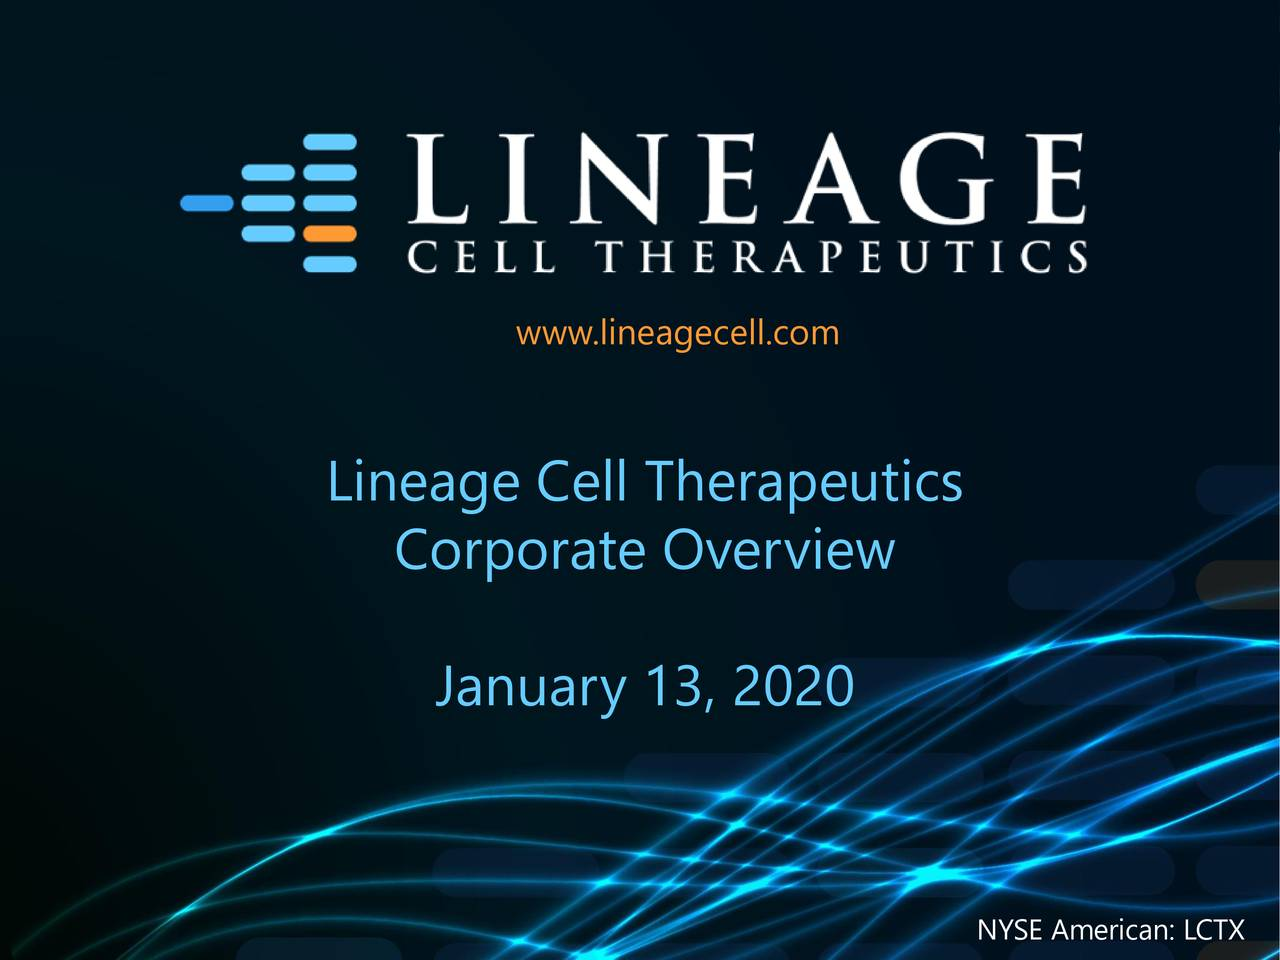 www.lineagecell.com